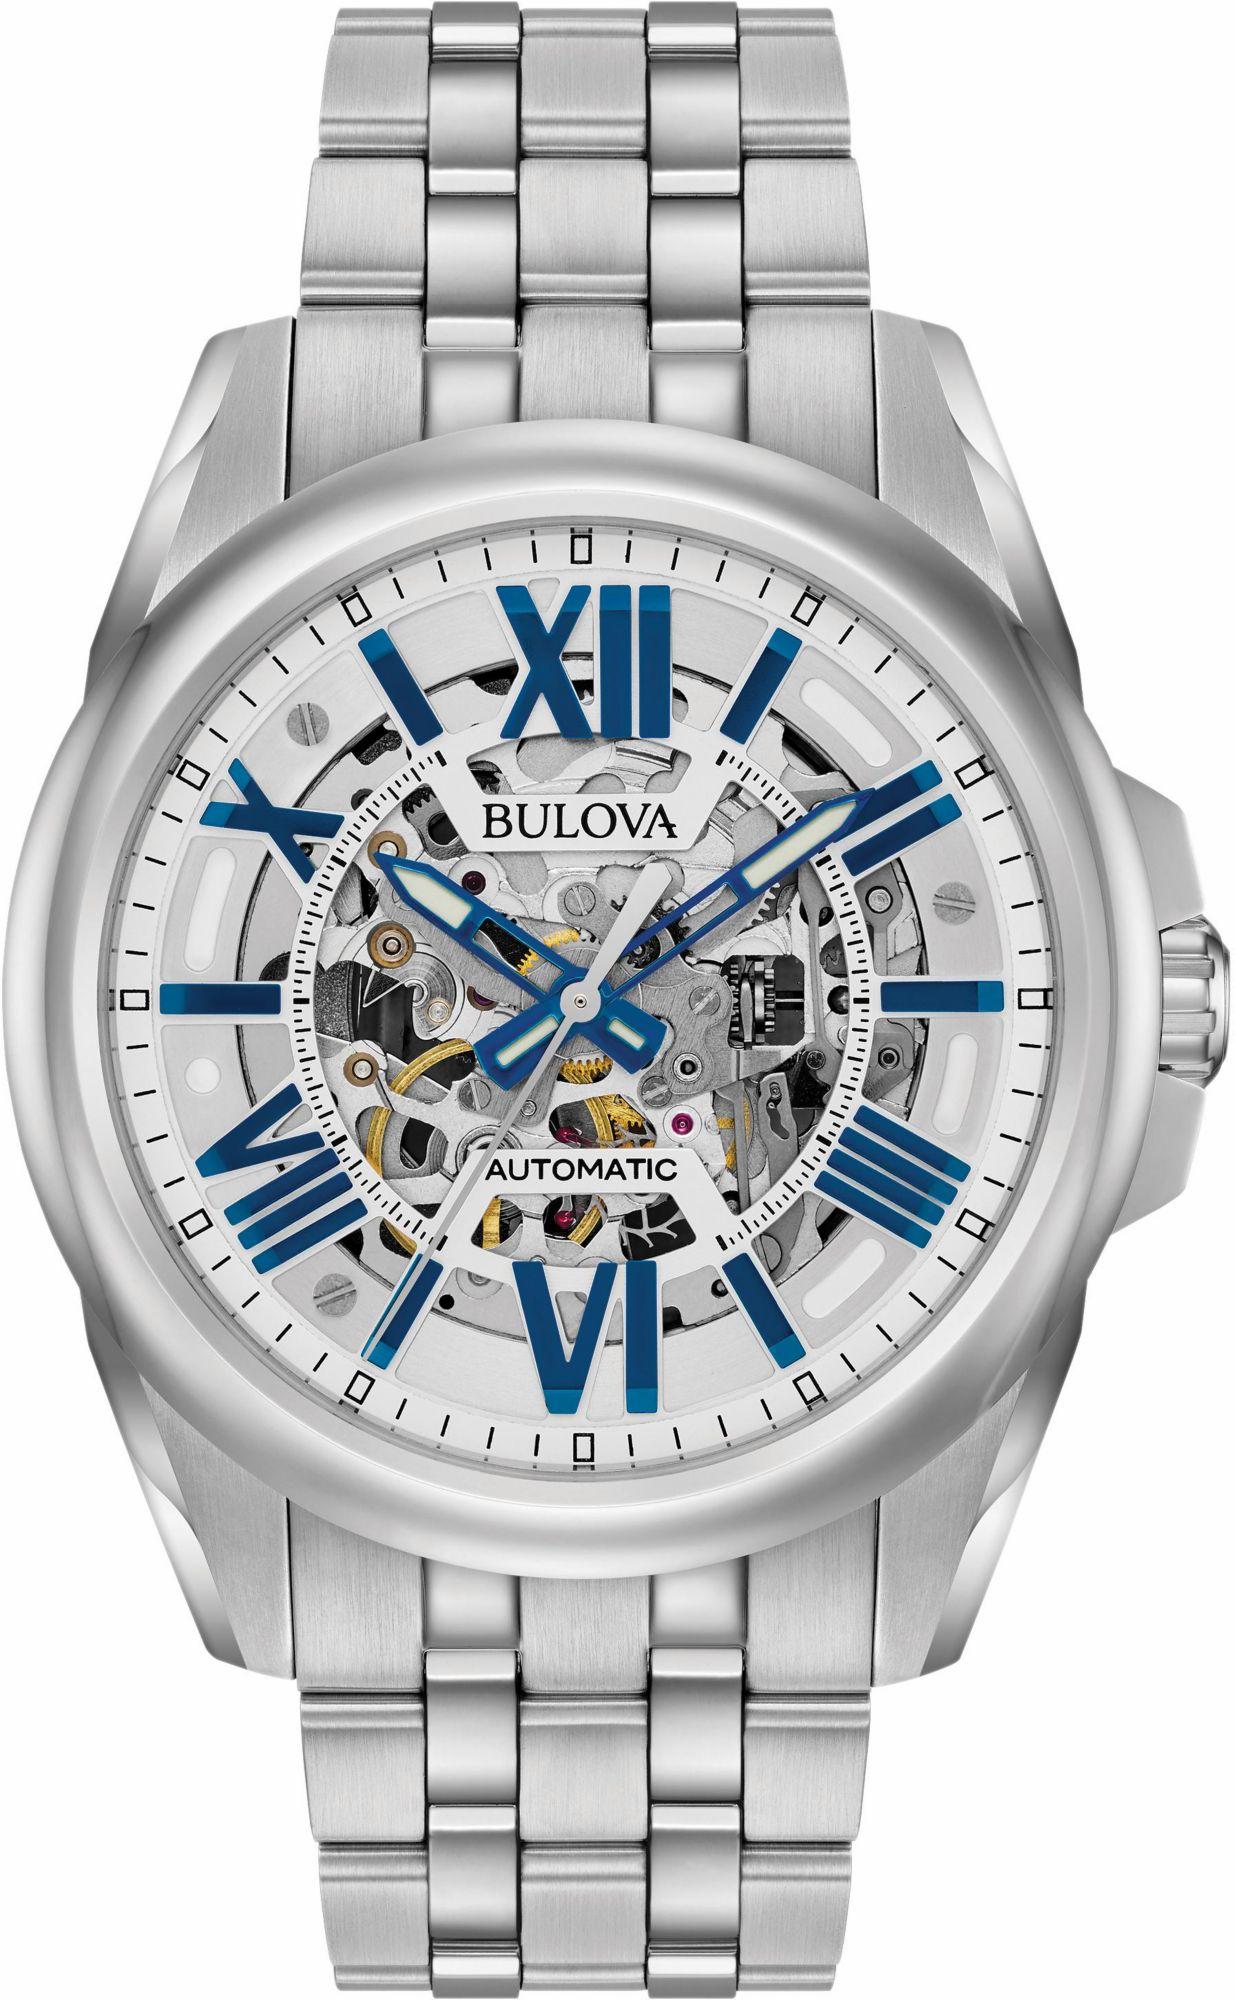 BULOVA Bulova Automatikuhr »Automatics, 96A187«